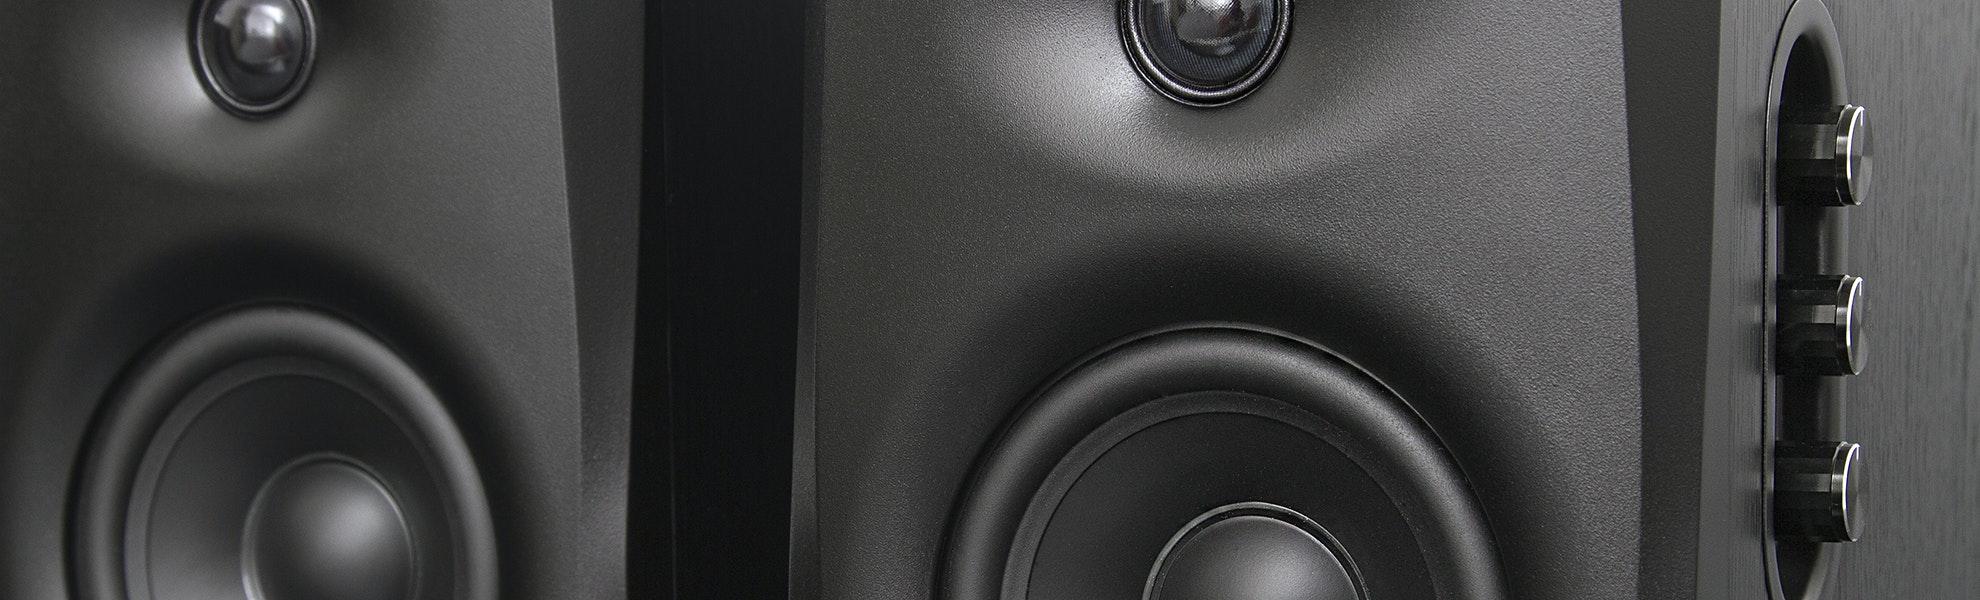 HiVi D1010/D1080 Mk IV Powered Speakers